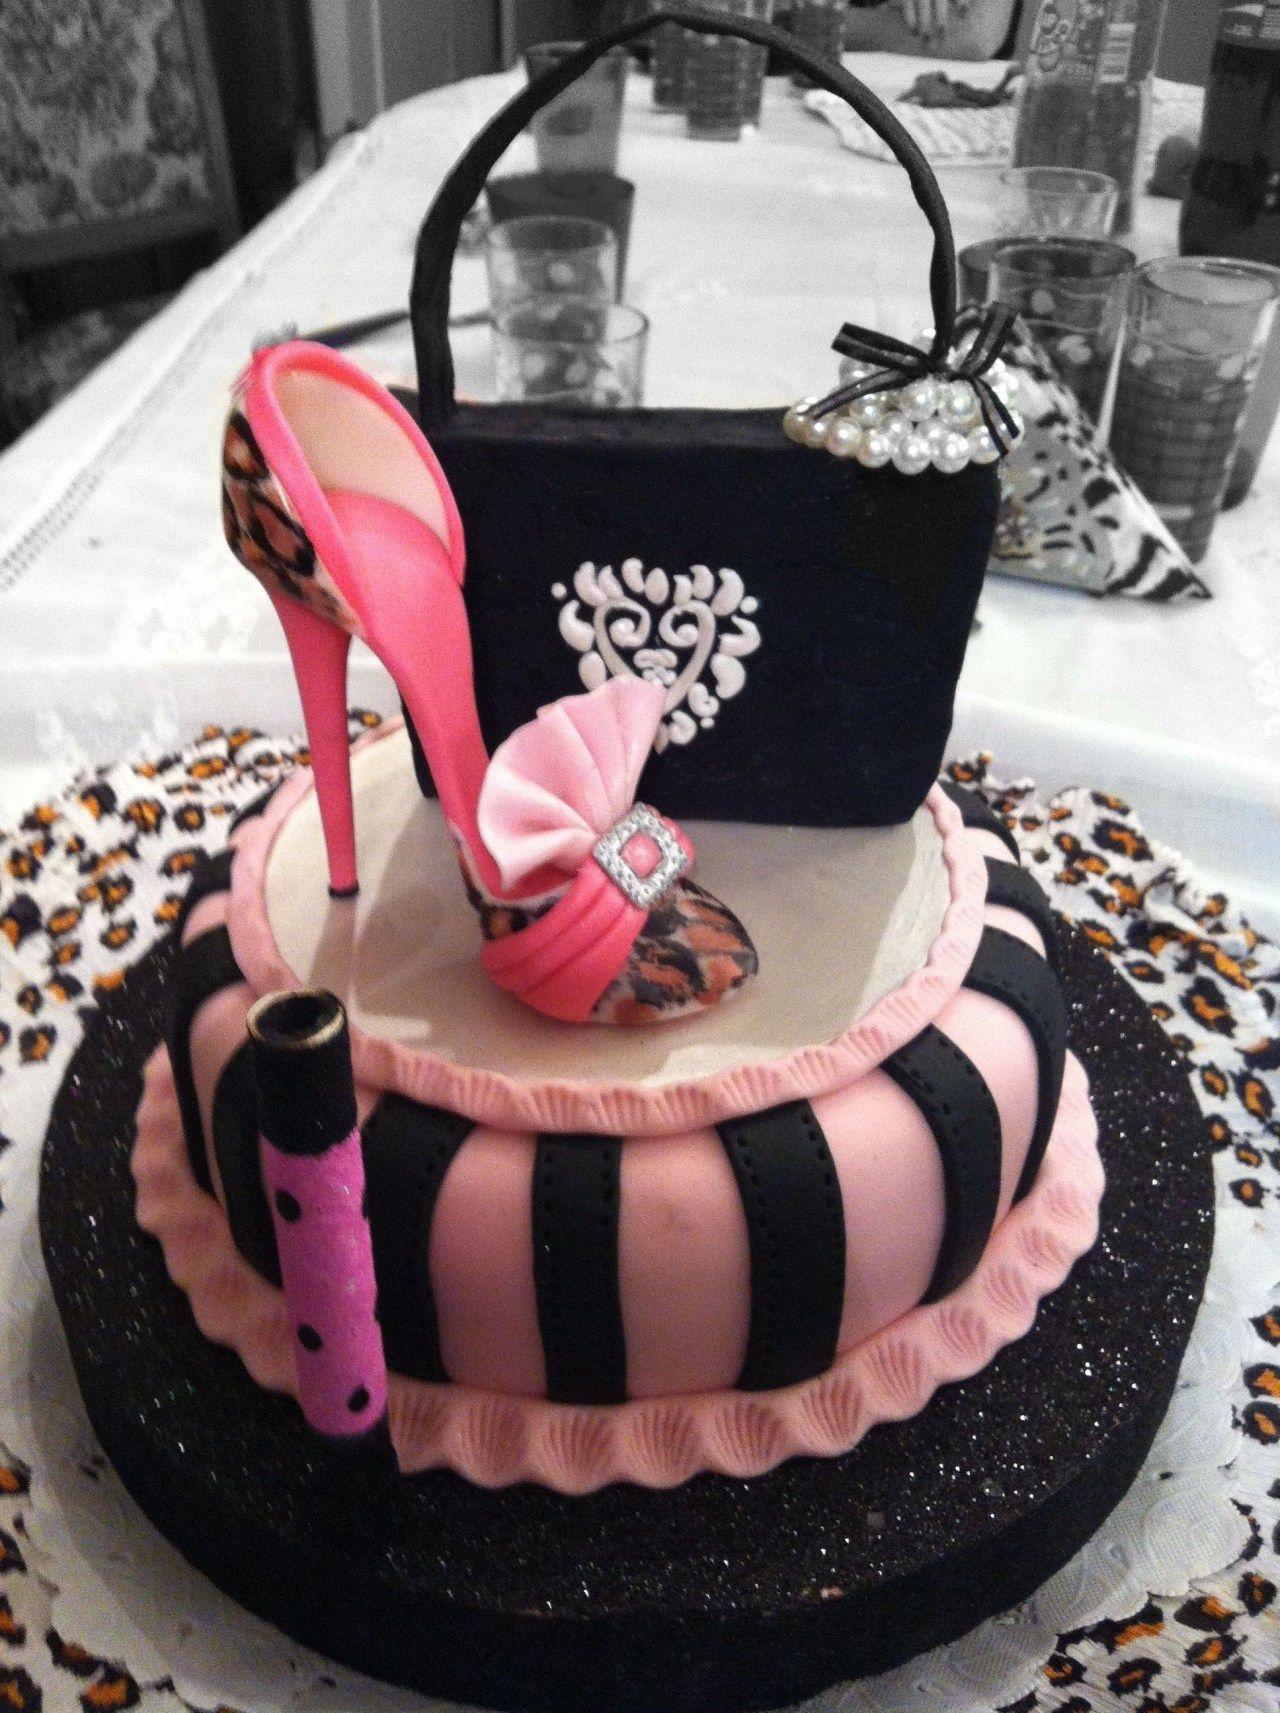 Terrific Woman Birthday Cake Top 20 Amazing Birthday Cake Women Ideas Cake Funny Birthday Cards Online Elaedamsfinfo